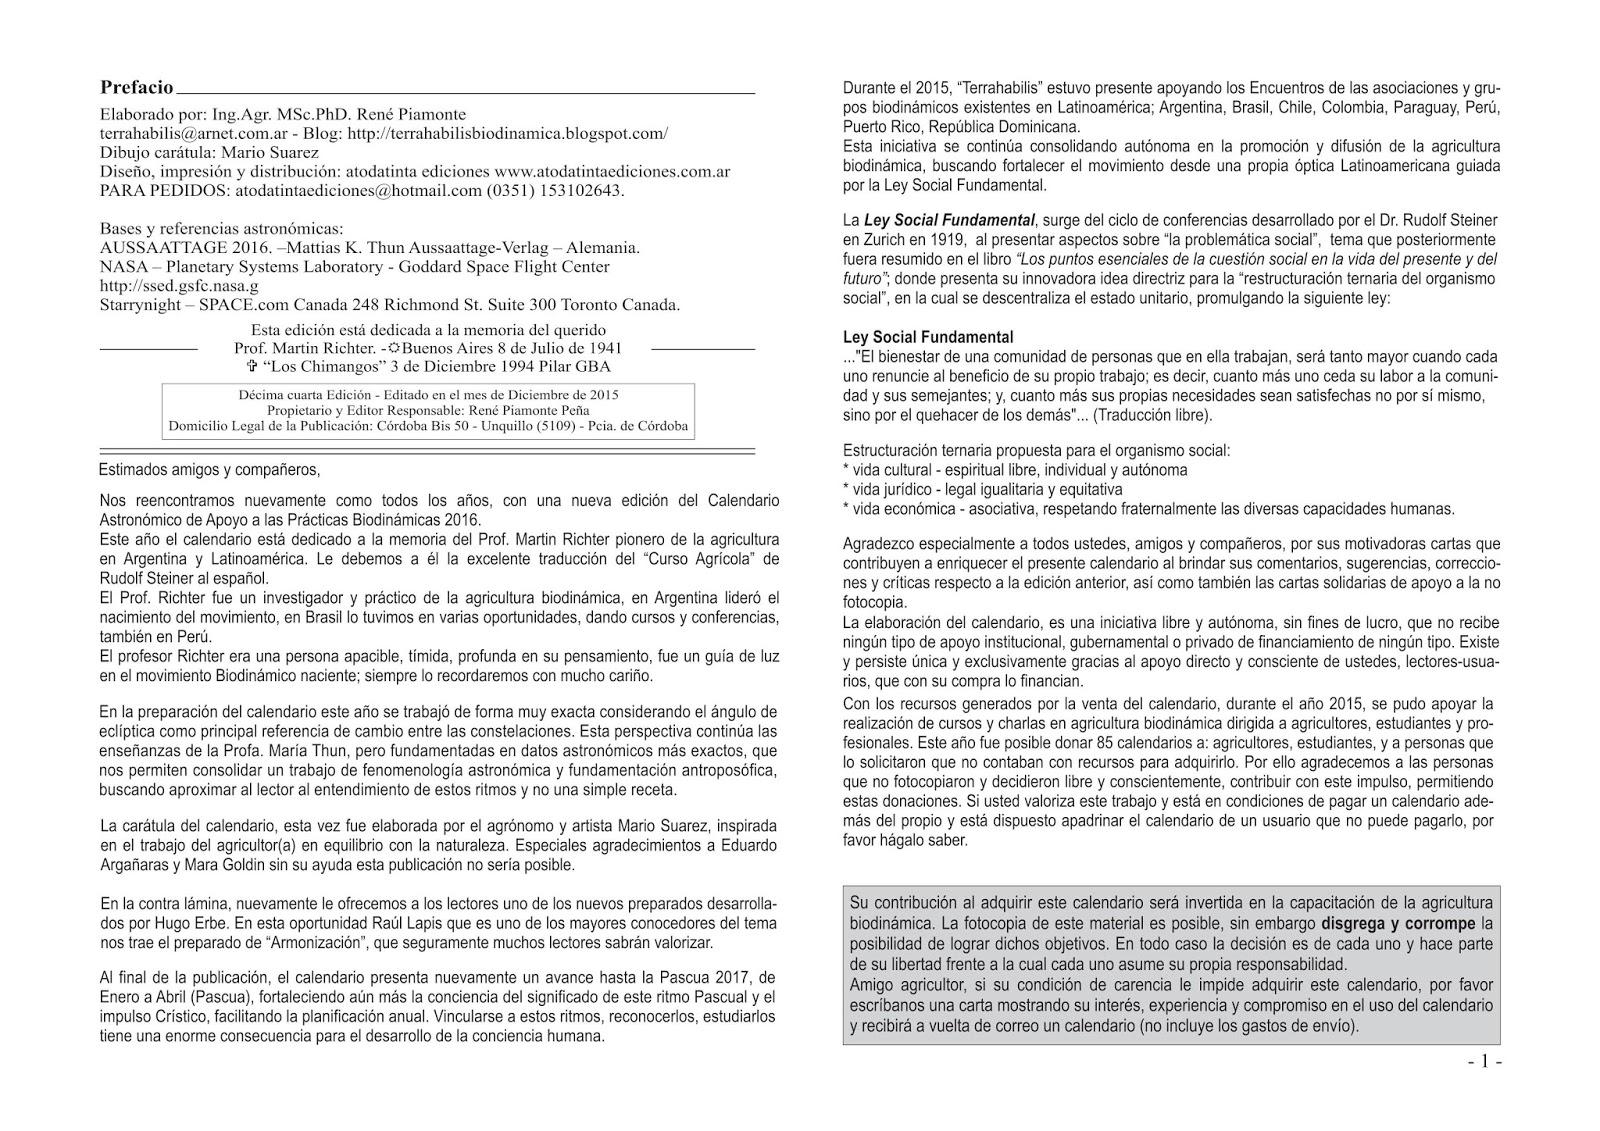 Terra habilis Biodinamica Rene Piamonte: Calendario Astronómico de ...